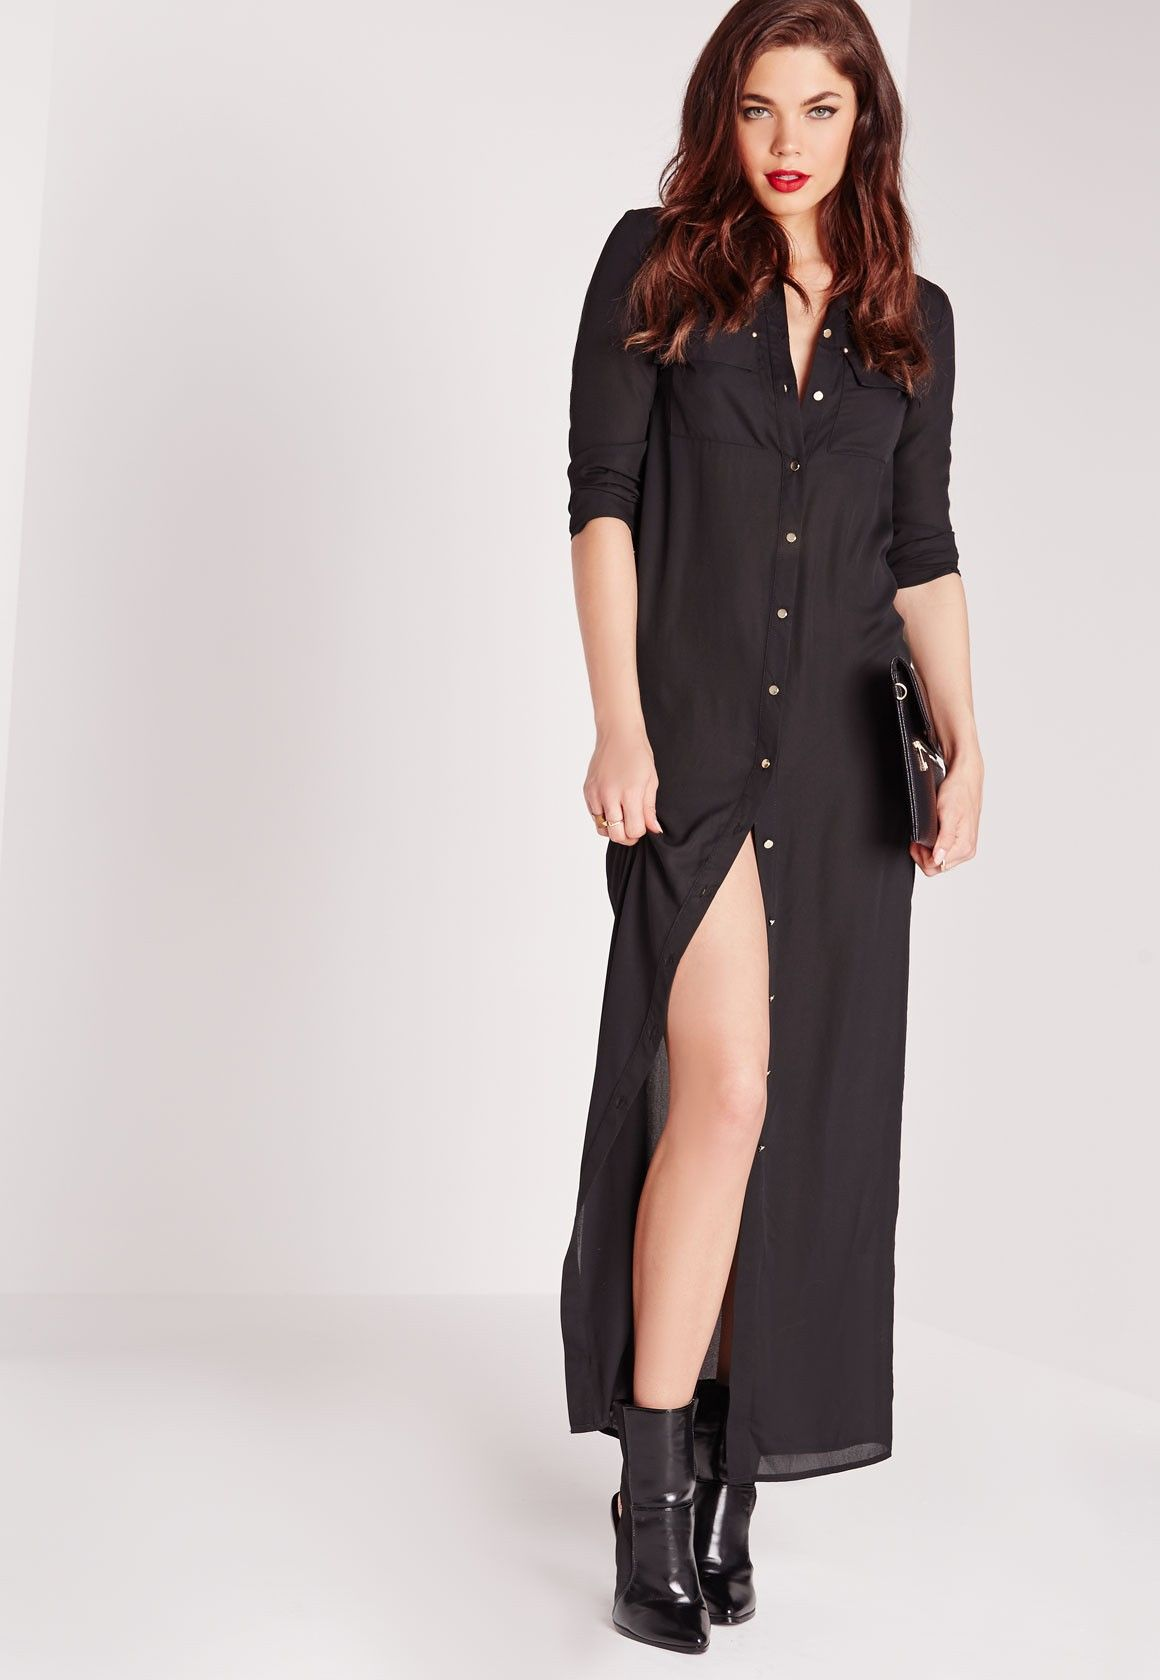 Maxi length long sleeve shirt dress black long sleeve shirt dress